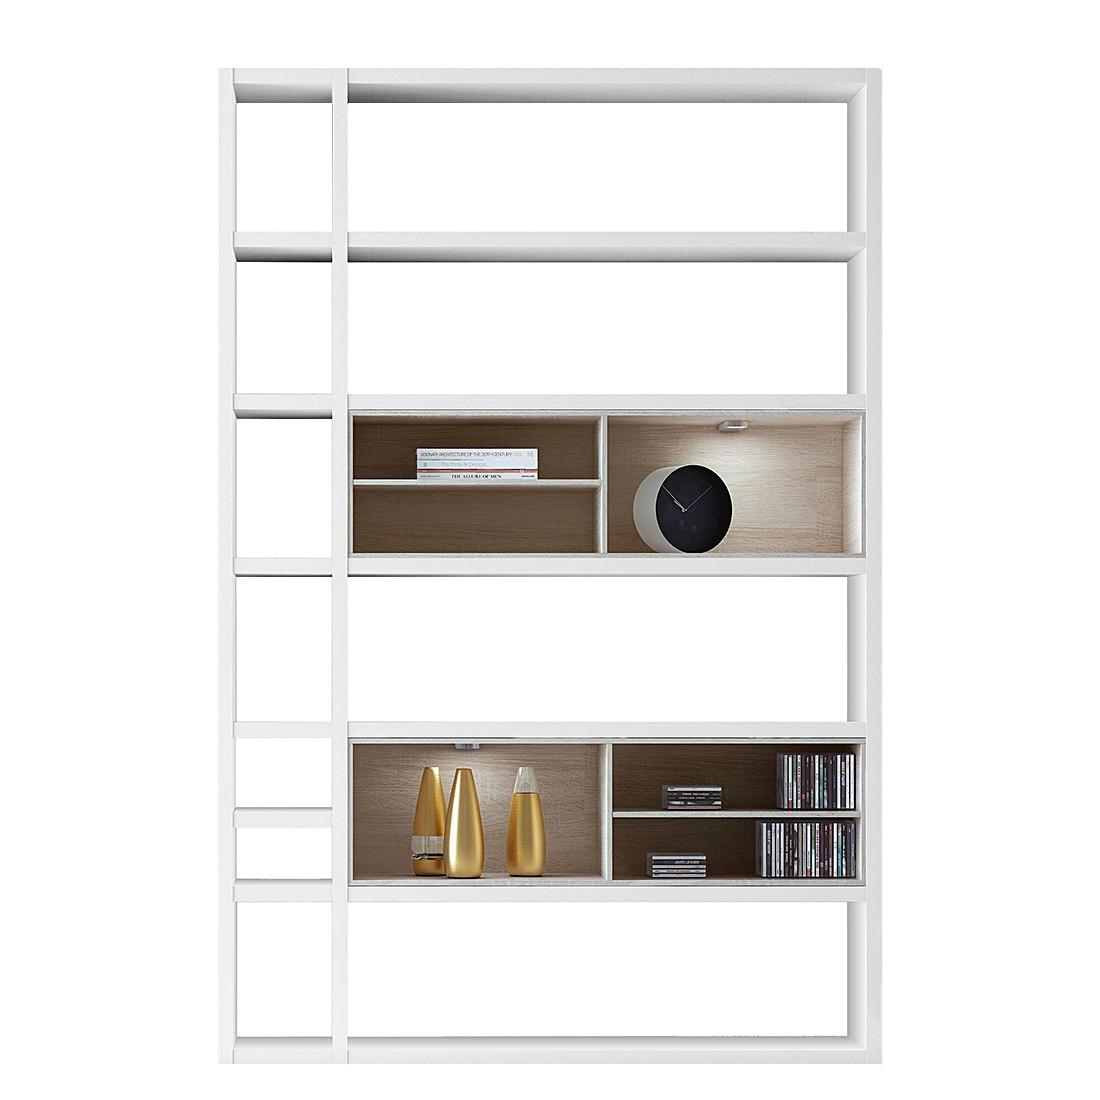 EEK A+, Regal Emporior I - RGB LED-Beleuchtung - Weiß / Eiche Sonoma Dekor, loftscape